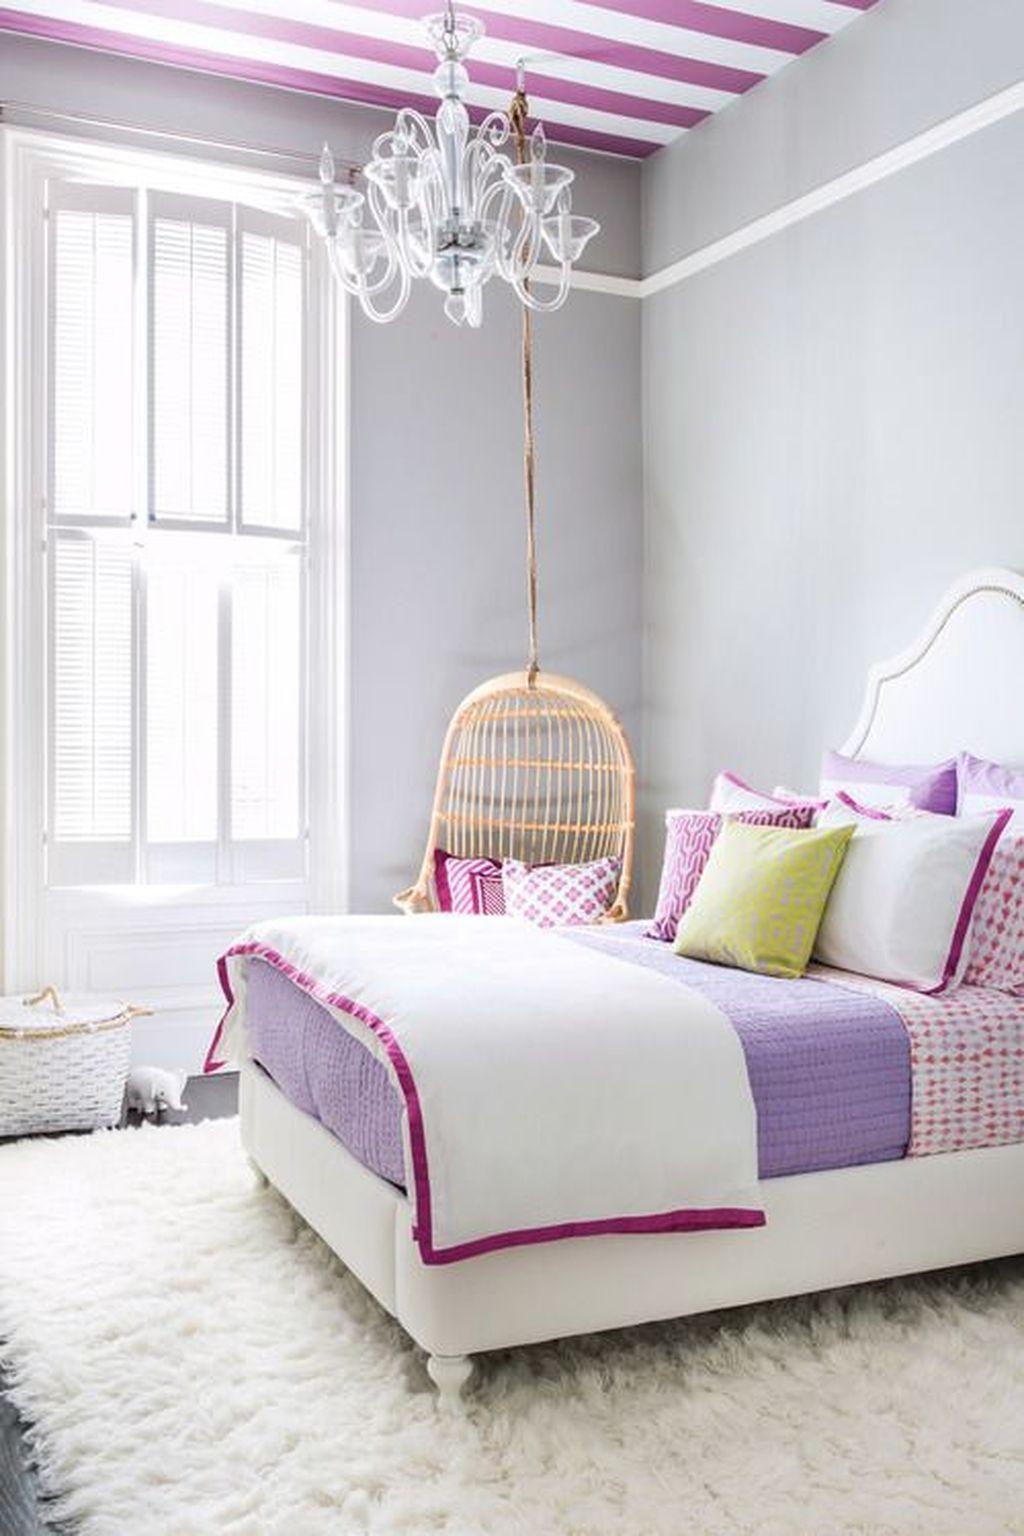 40 Stunning Striped Ceiling Bedroom Decor Ideas In 2021 Girls Room Design Girl Bedroom Decor Childrens Room Decor